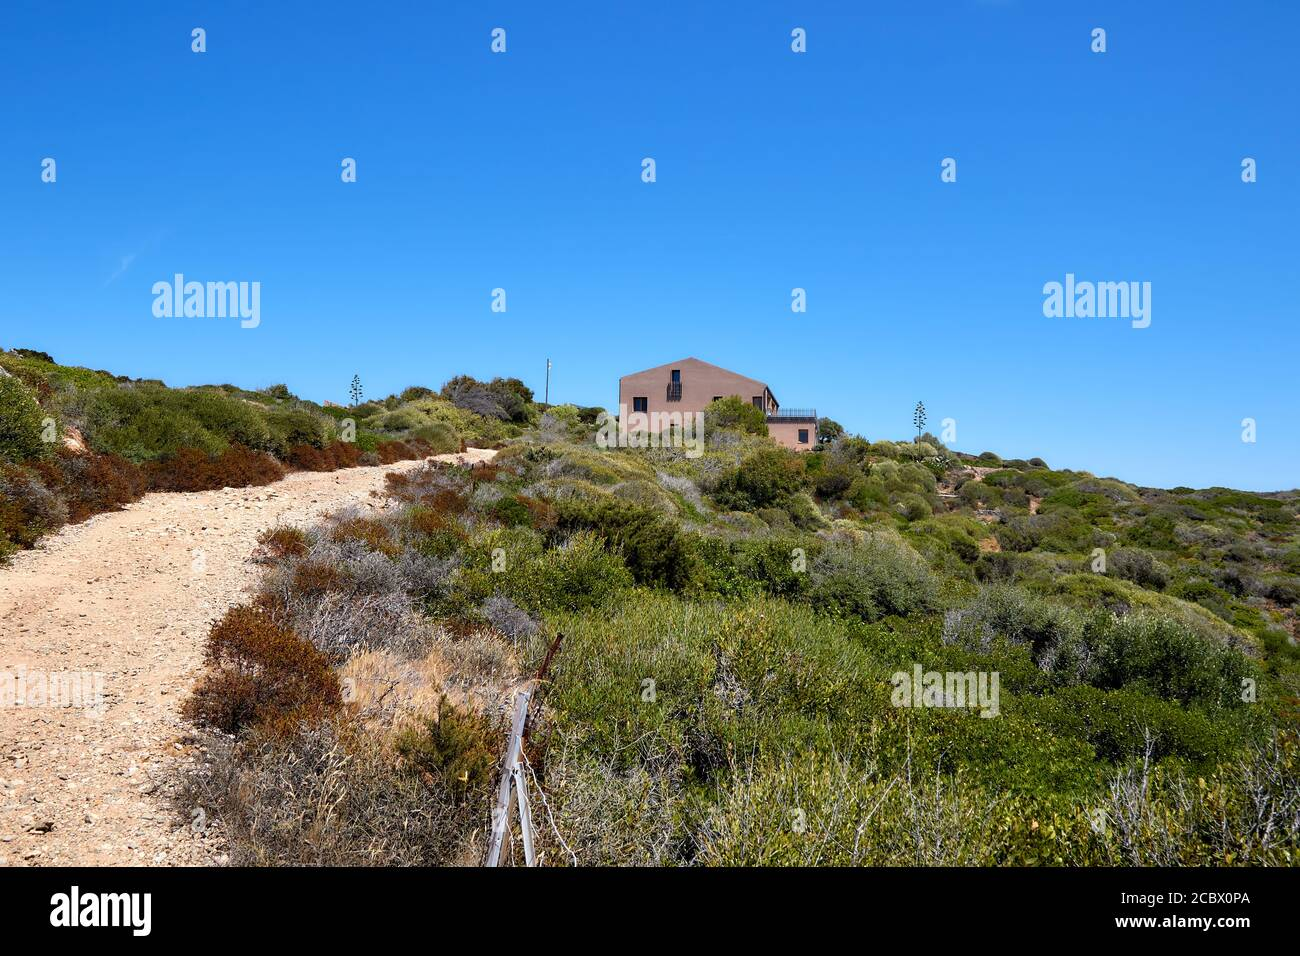 Isola Santa Maria island, wunderlasts view for rocks and shrubs Stock Photo